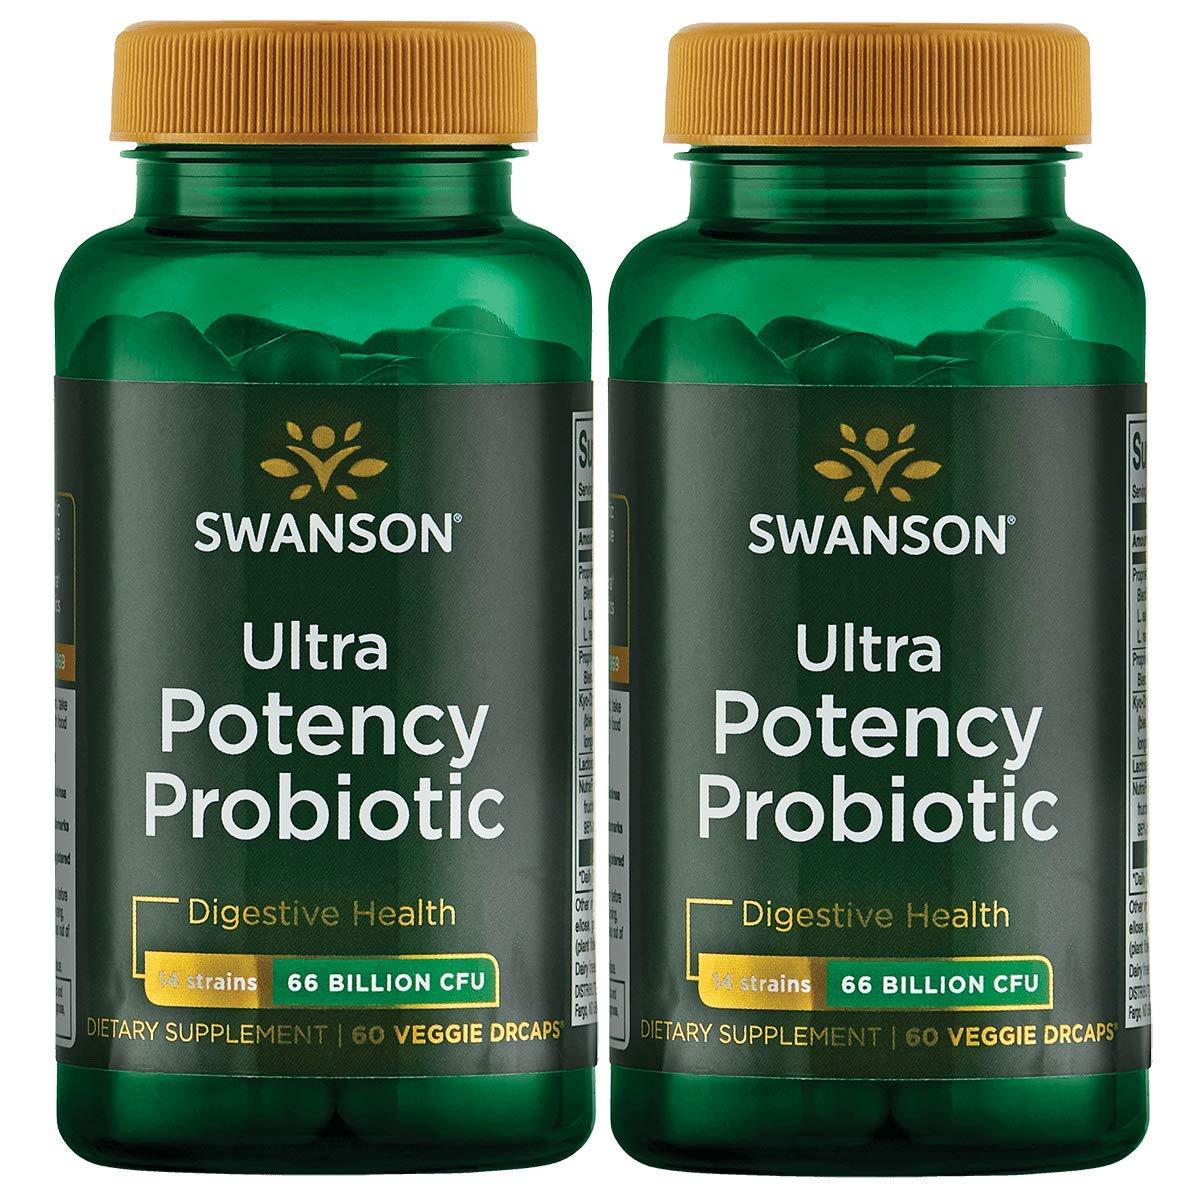 Swanson Ultra Potency Probiotic Digestive Health Immune System Support 66 Billion CFU Prebiotic NutraFlora scFOS 60 DRcaps Veggie Capsules (Caps) (2 Pack)